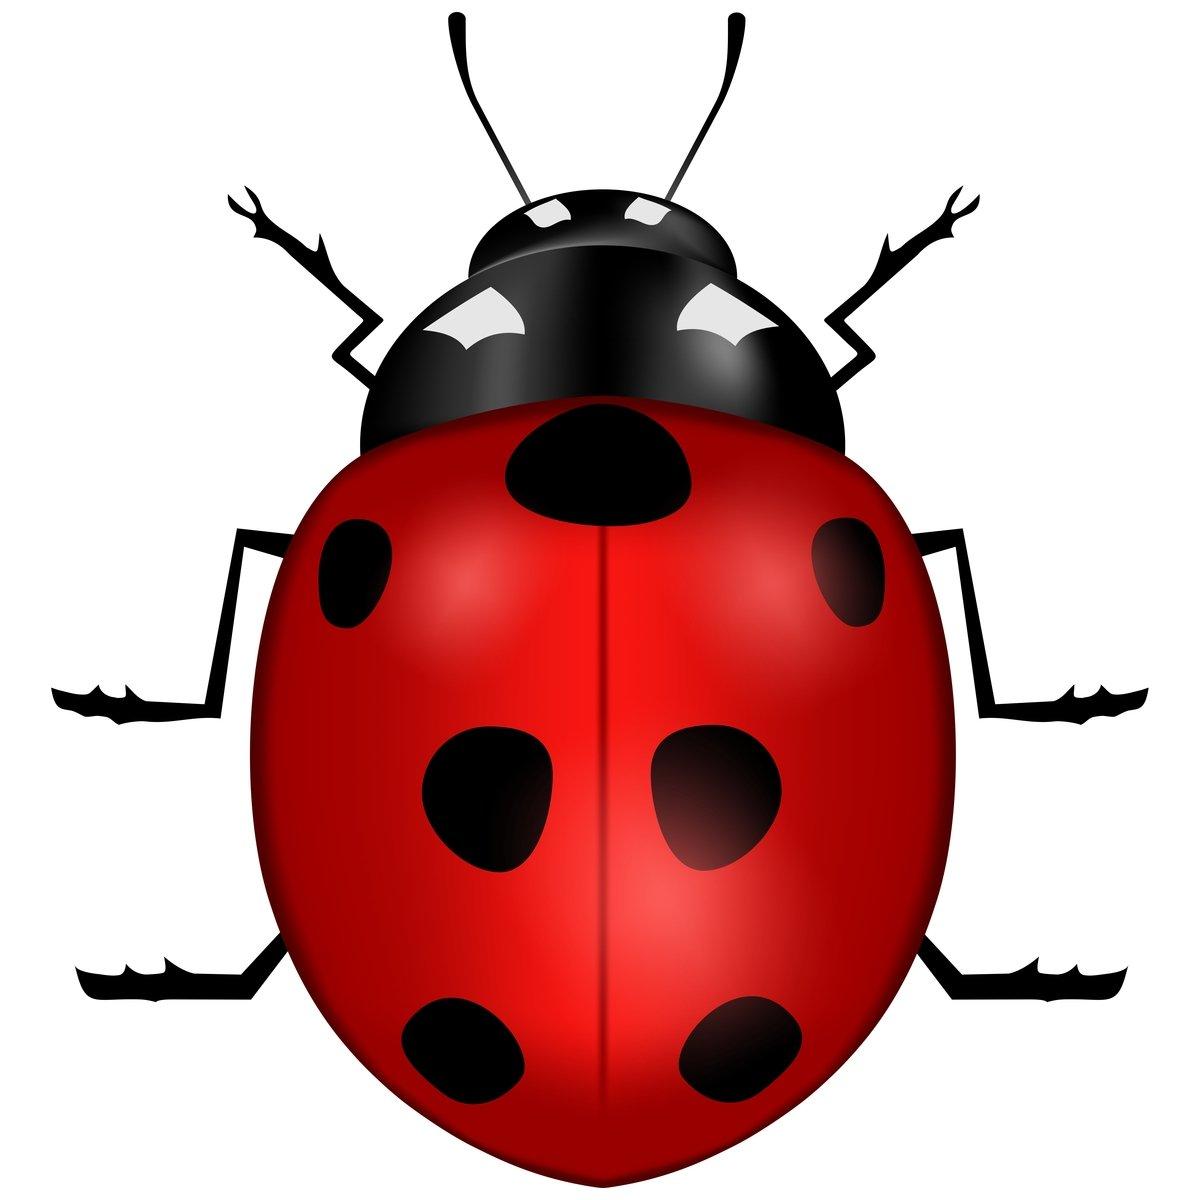 Free vector ladybug stock photo freeimages free vector ladybug stock photo stopboris Image collections